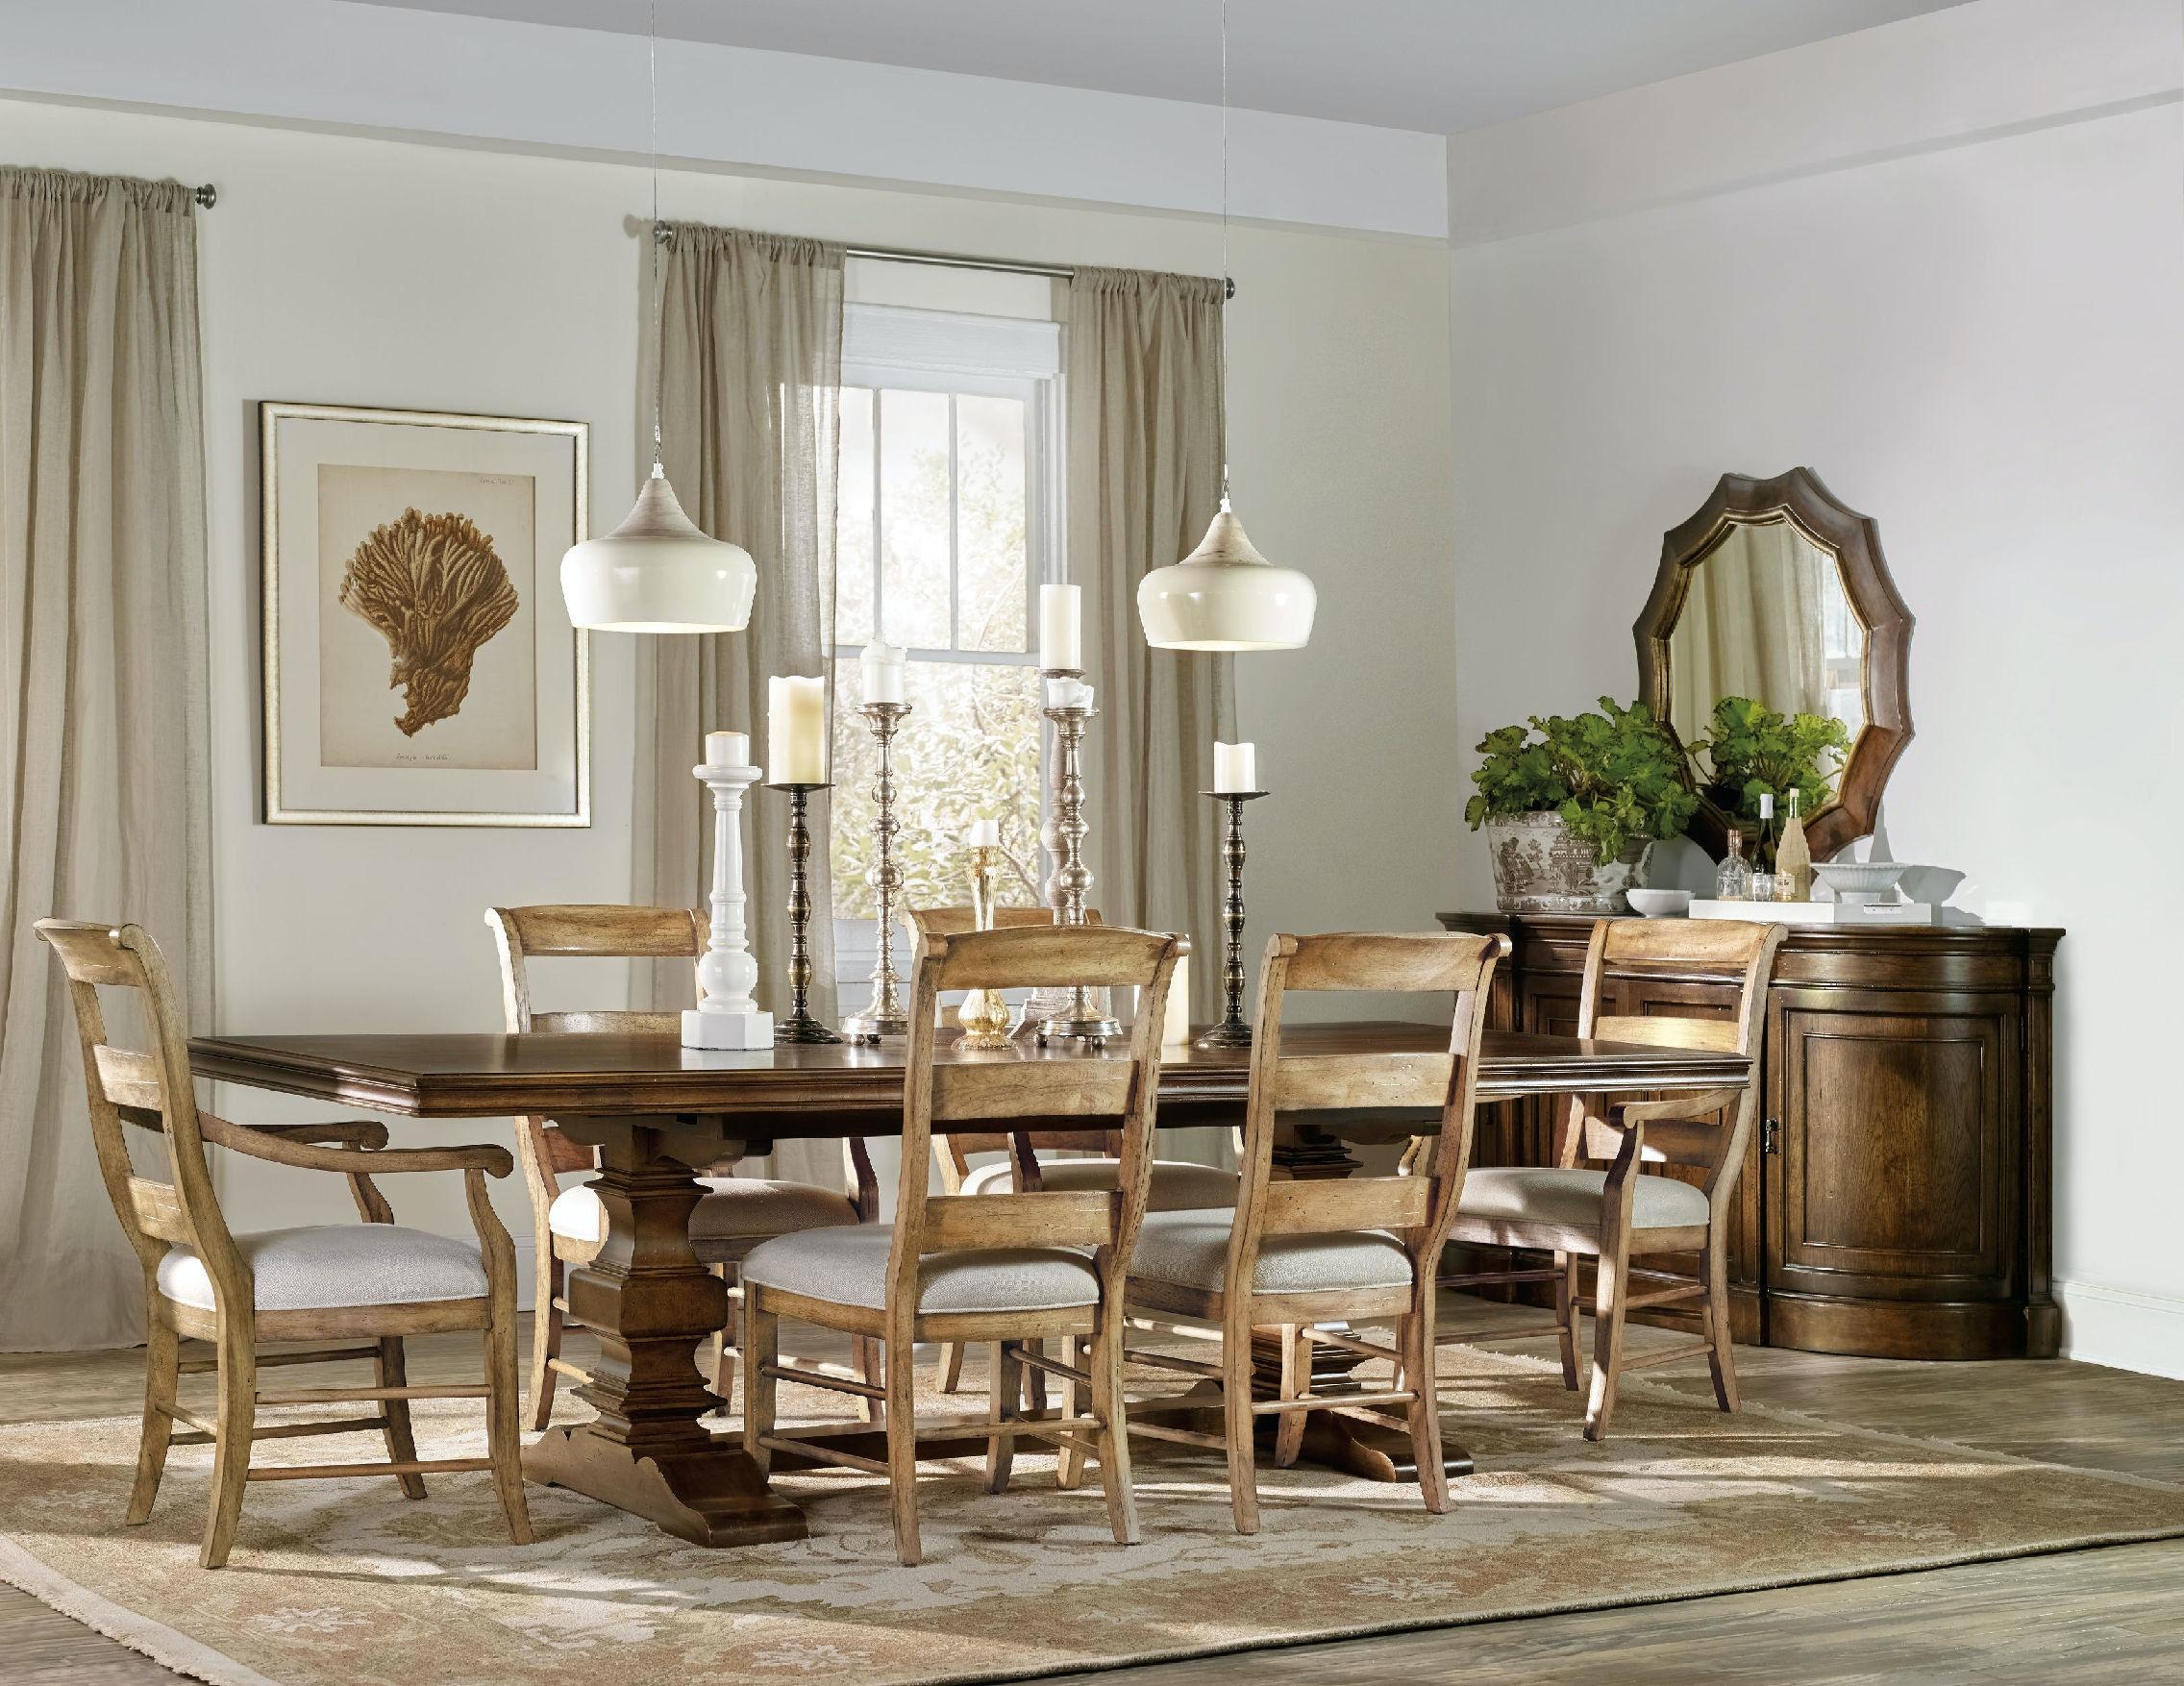 hooker furniture dining room archivist trestle table w 2 18in hooker furniture archivist trestle table w 2 18in leaves 5447 75206